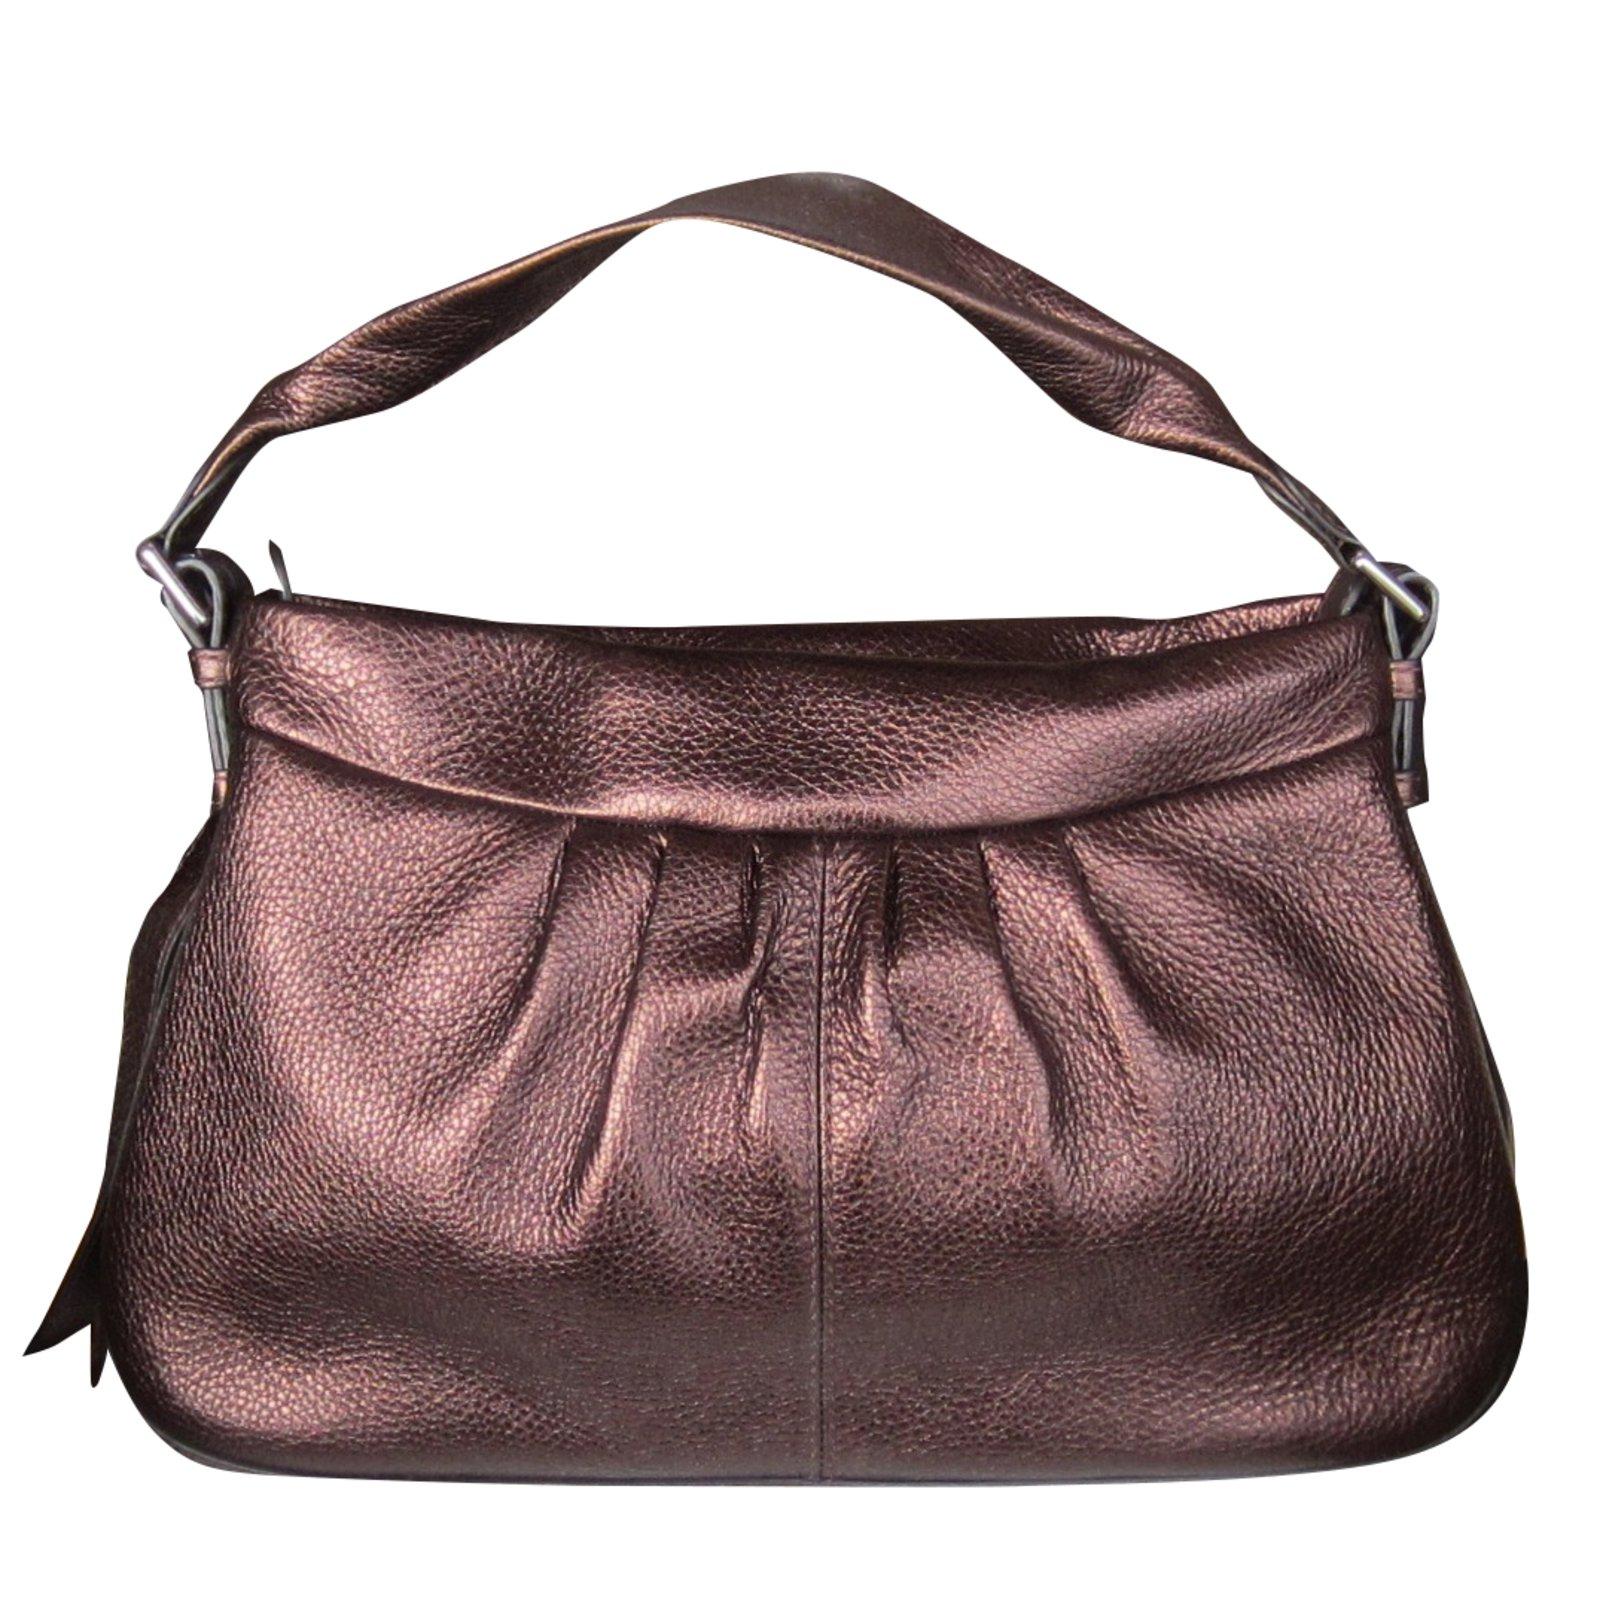 2b2caca6c64a Lancel Handbag Handbags Leather Other ref.28641 - Joli Closet